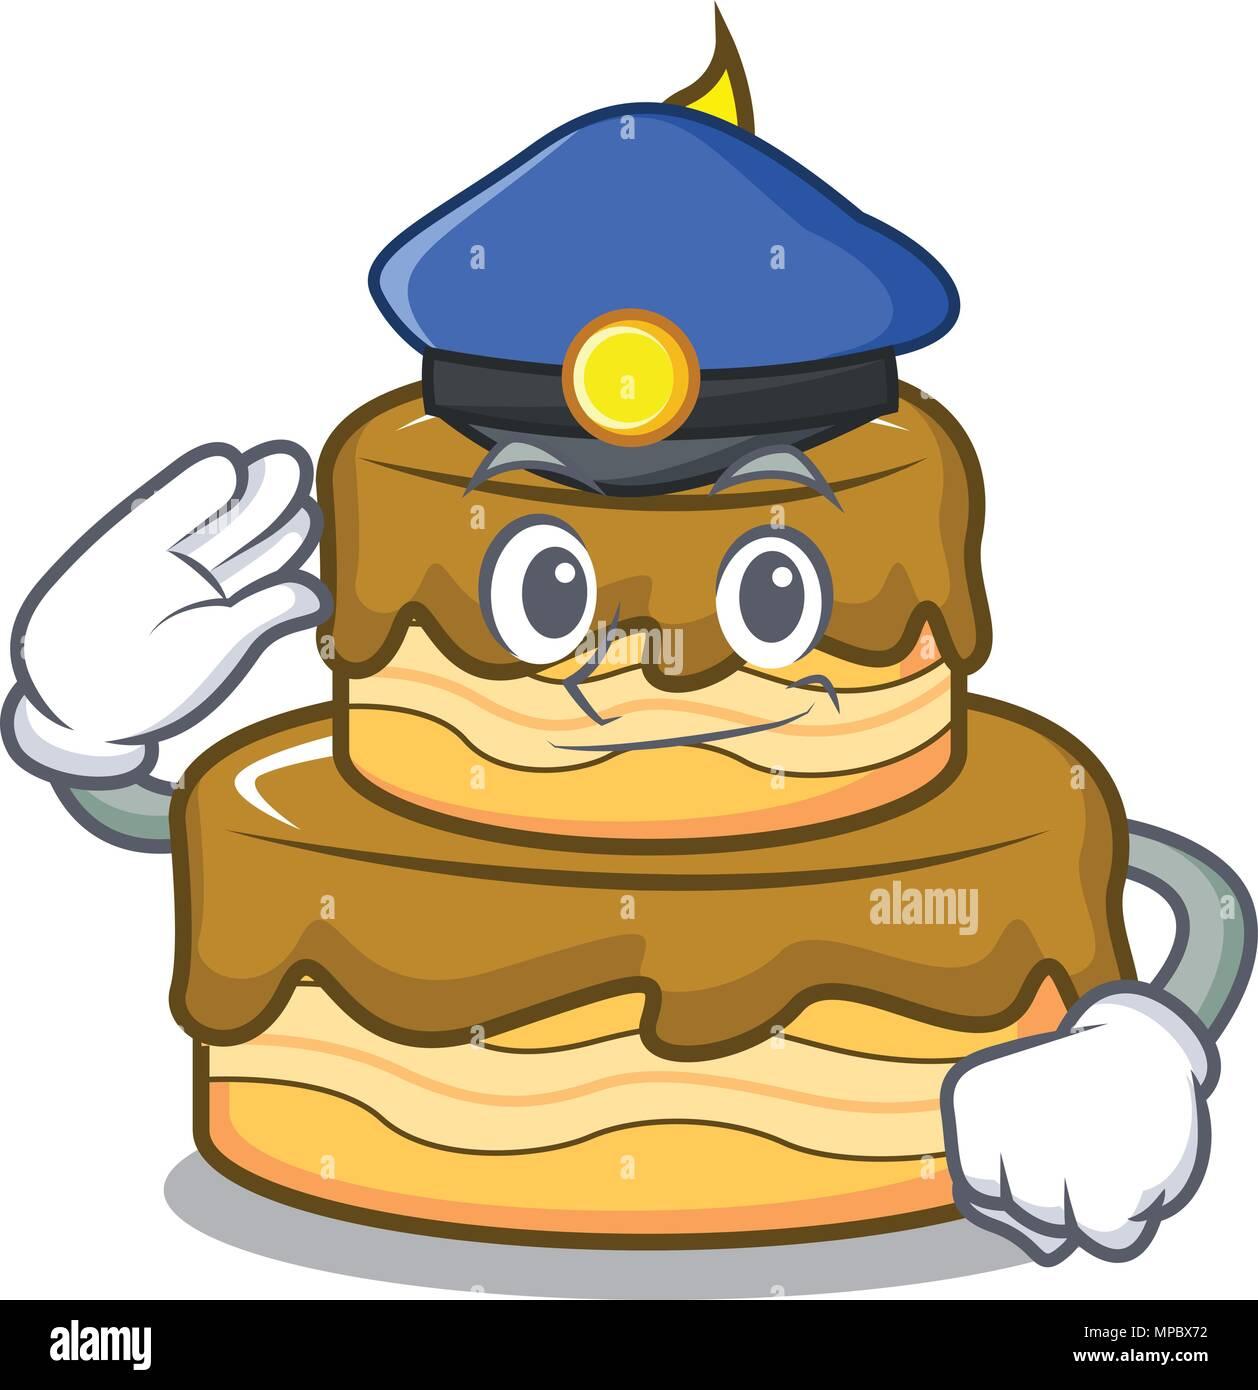 Marvelous Police Birthday Cake Character Cartoon Stock Vector Art Funny Birthday Cards Online Hendilapandamsfinfo